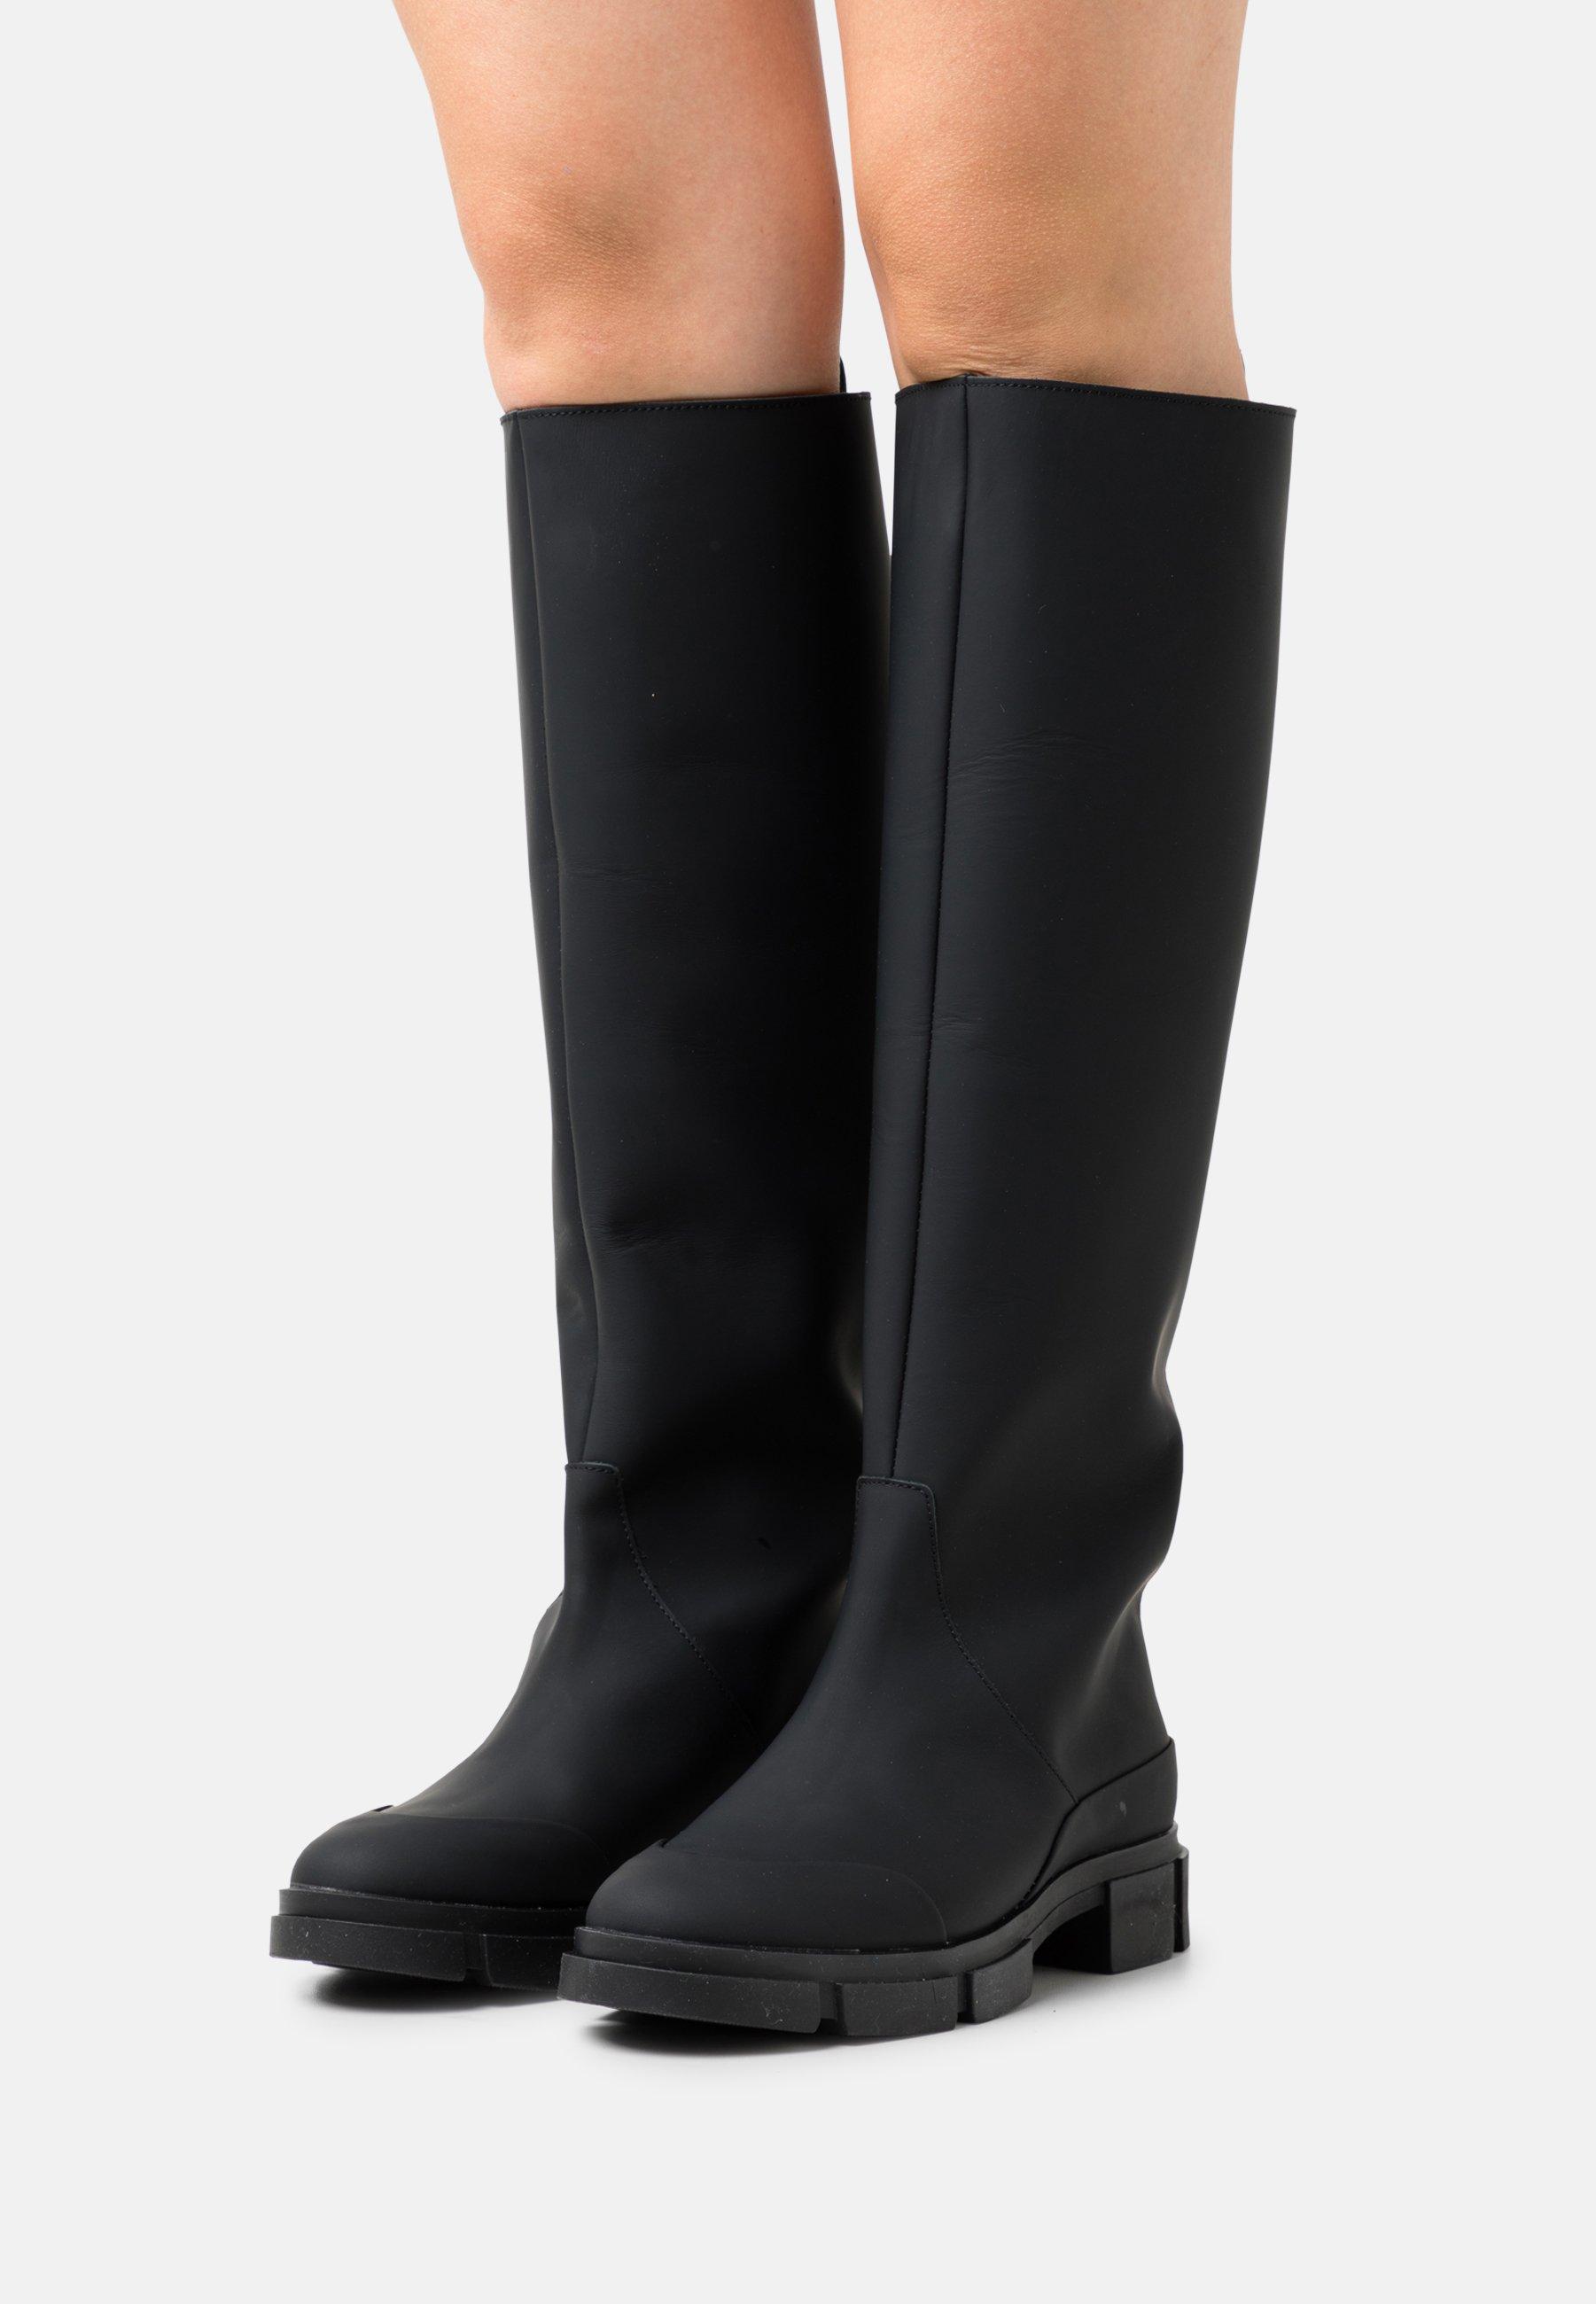 Femme YASRAINY KNEE HIGH BOOTS - Bottes